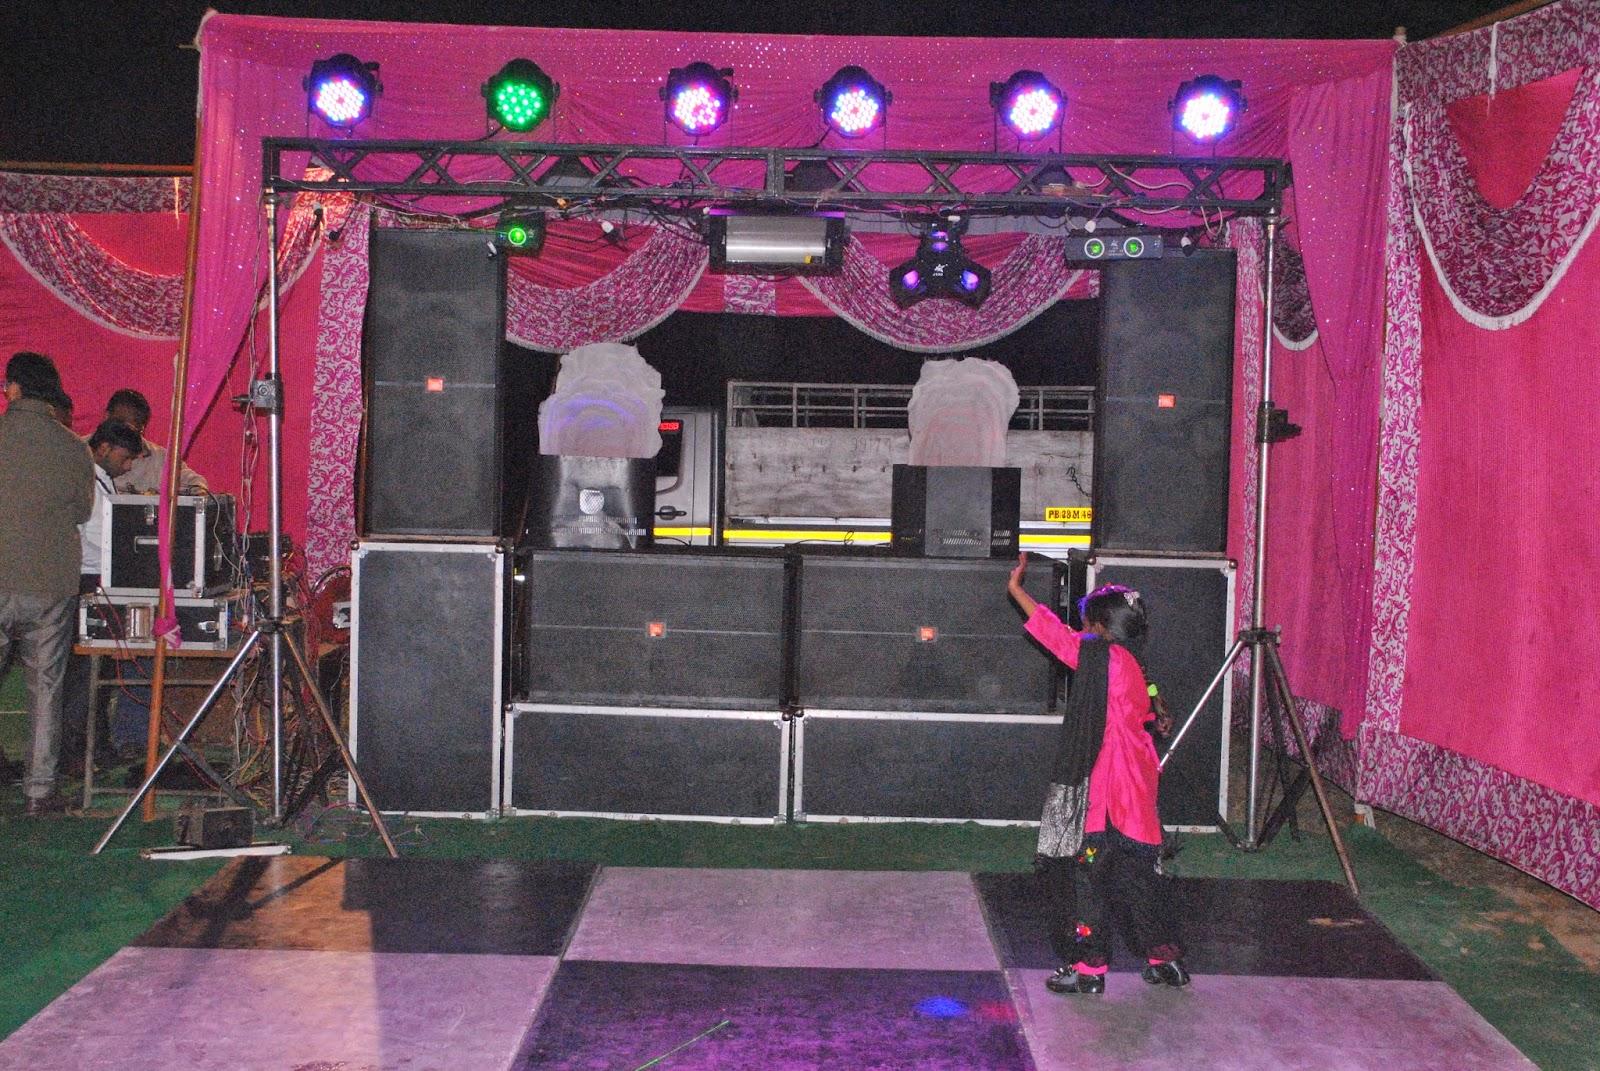 YASH DJ SETUP AND LIGHT DECORATION